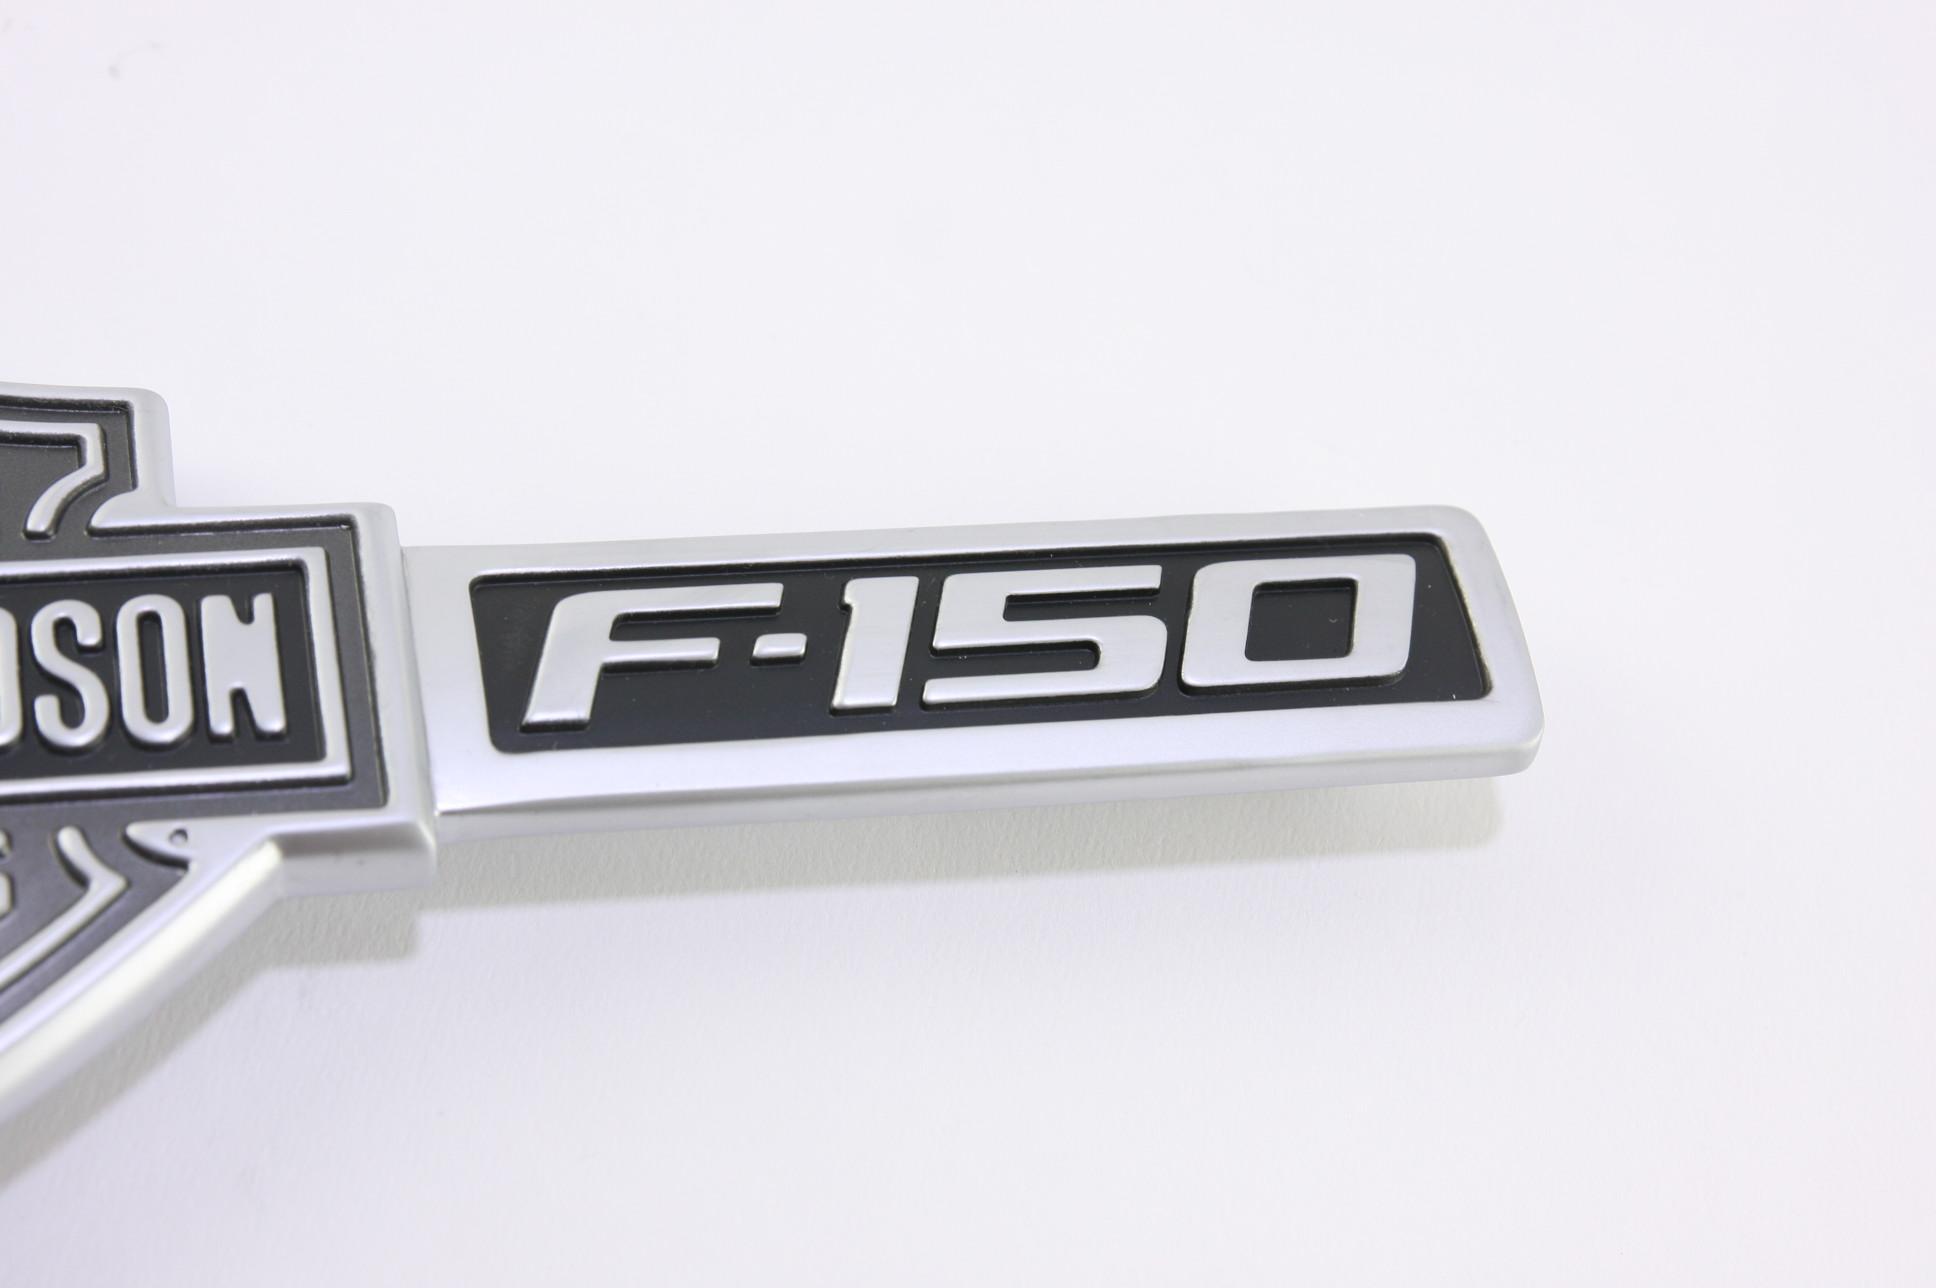 *** New Genuine Ford OEM BL3Z16720B 09-12 F150 Harley Davidson Free Shipping NIP - image 5